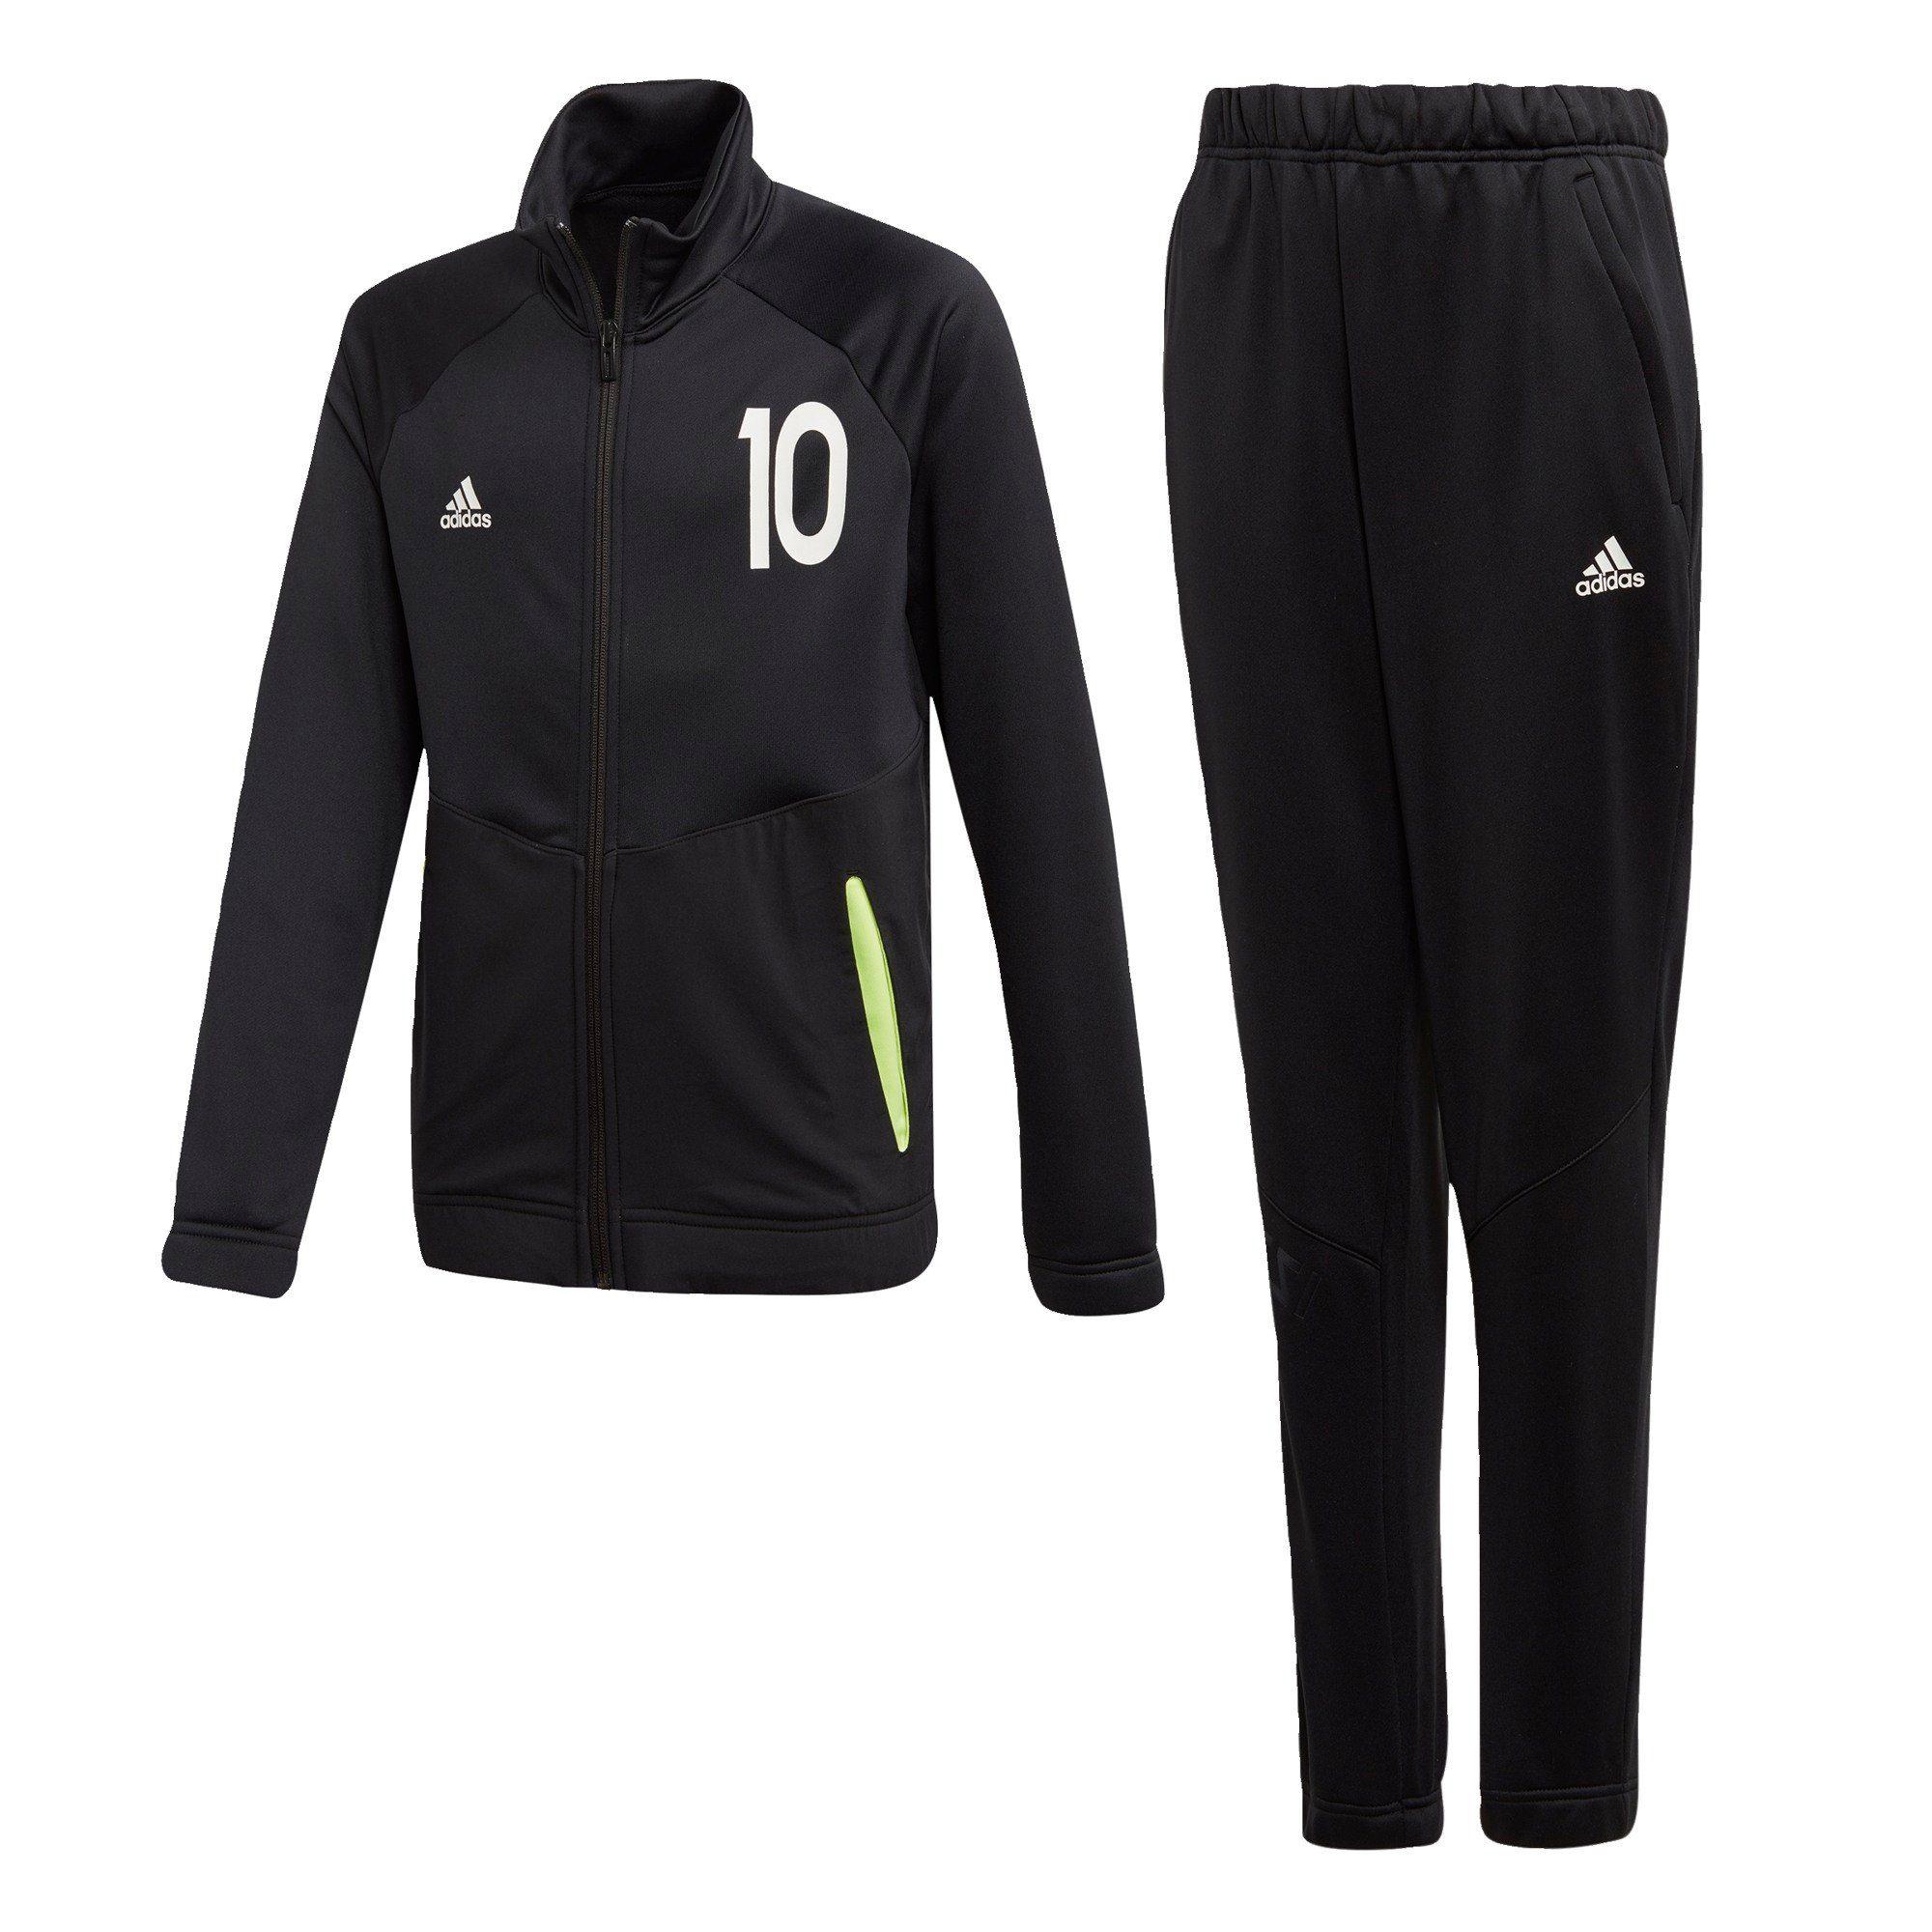 adidas Performance Trainingsanzug »Messi Trainingsanzug«, Clima;RDY online kaufen | OTTO